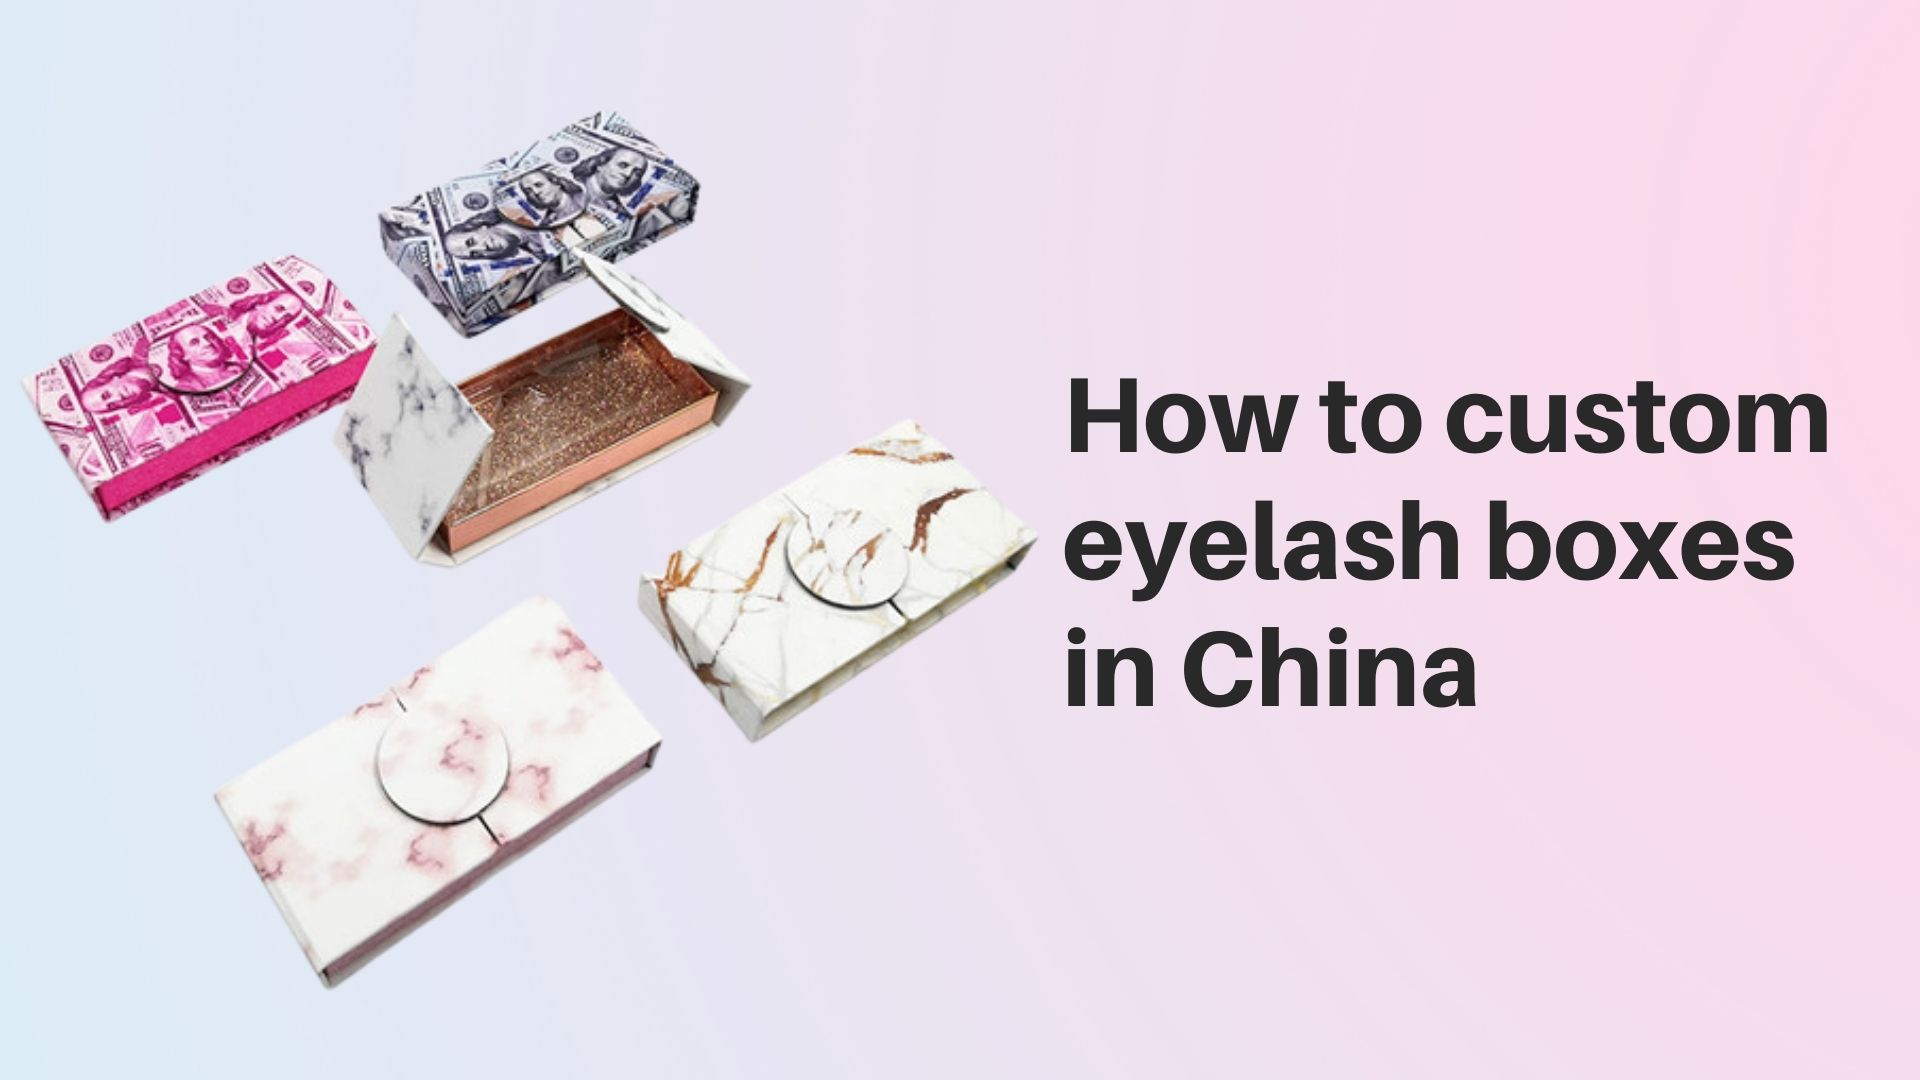 How to custom eyelash boxes in China